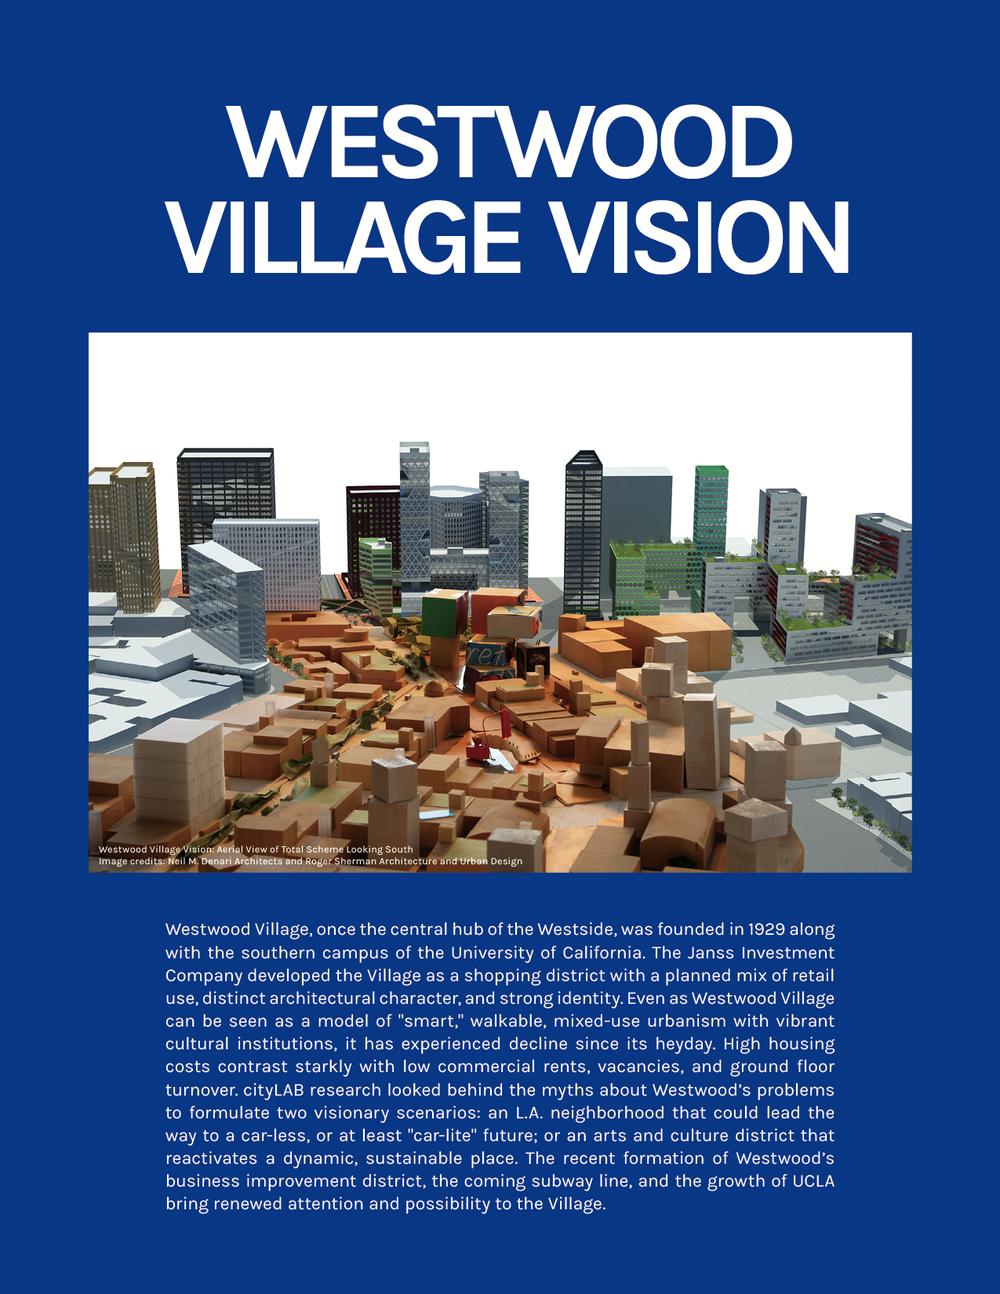 Place:  Westwood Village Vision